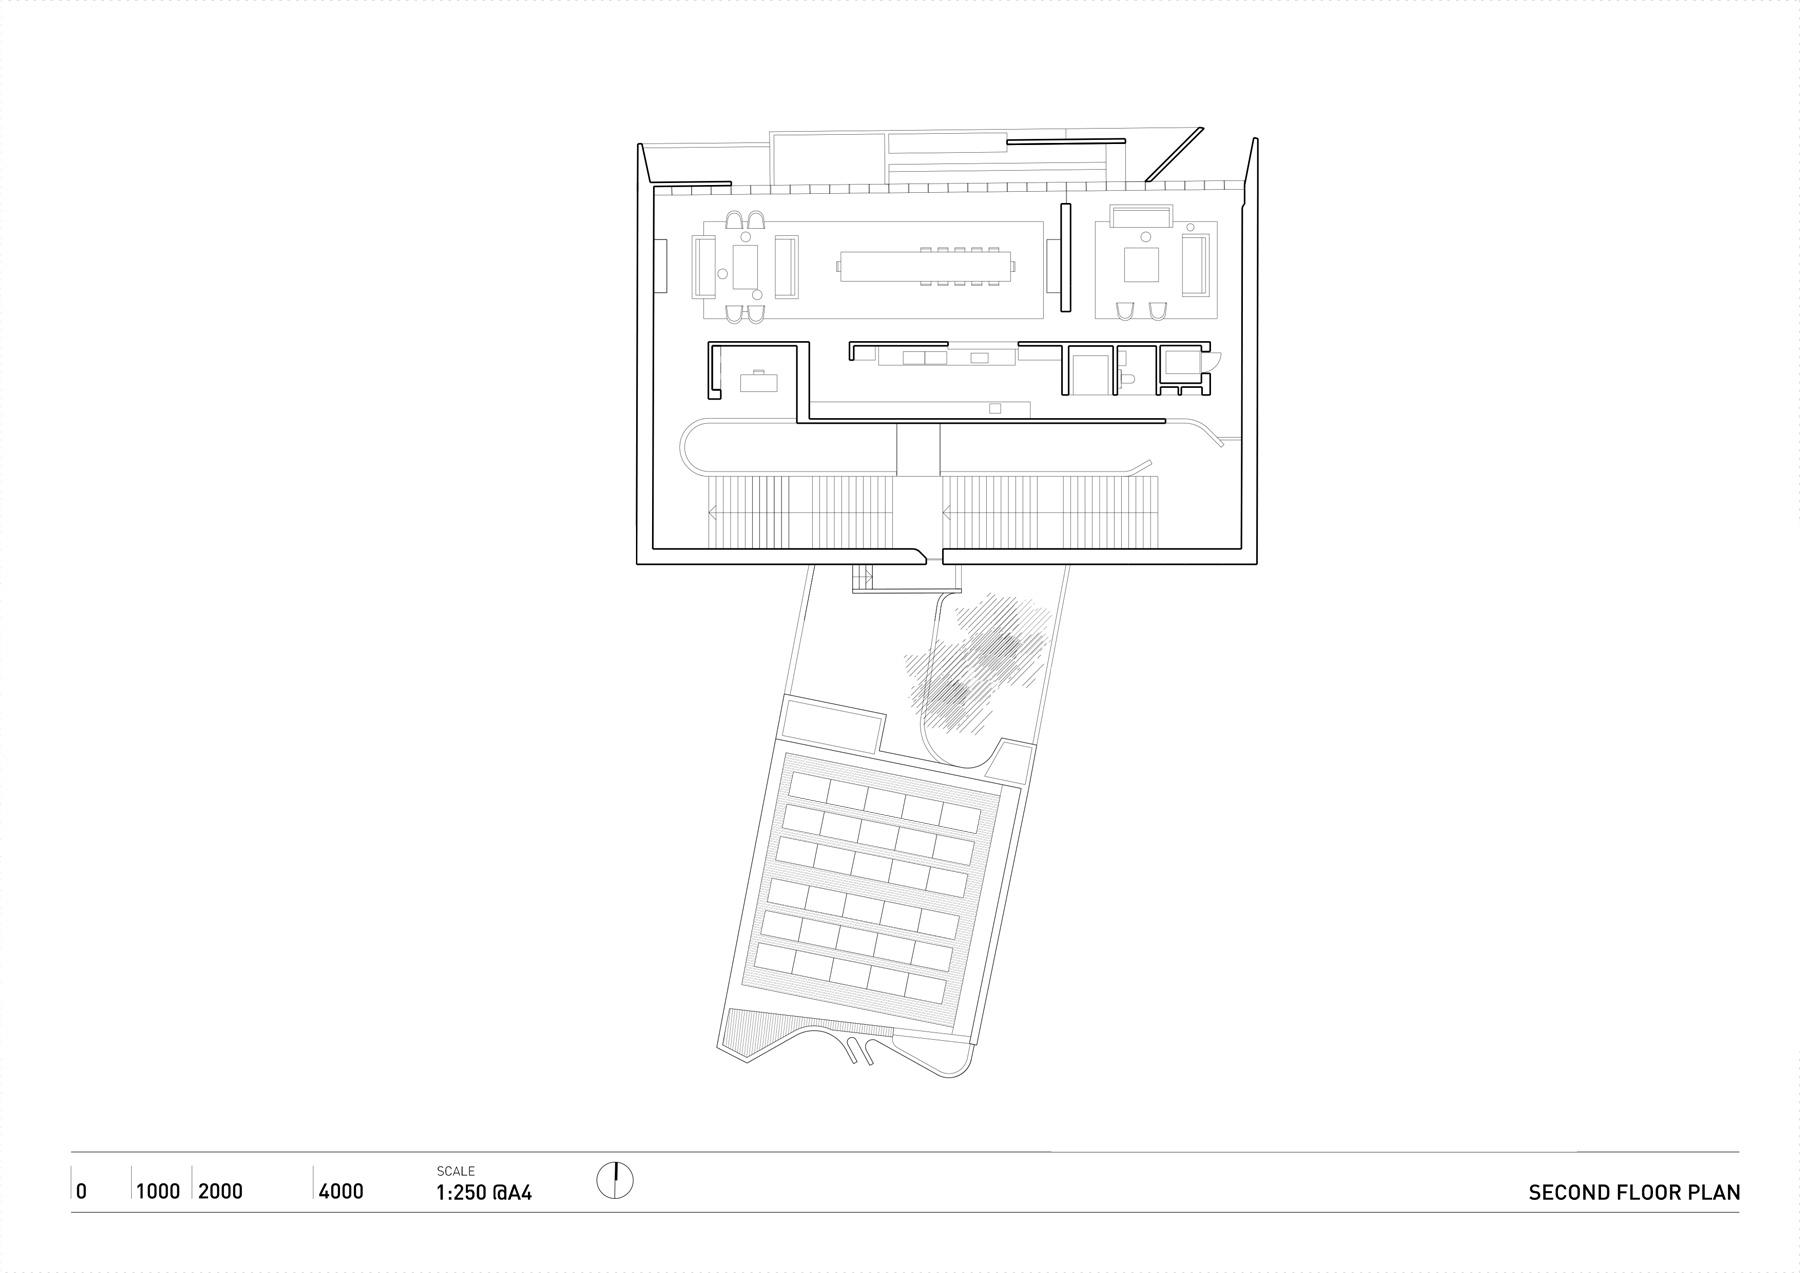 Indigo Slam Second Floor Plan | Yellowtrace